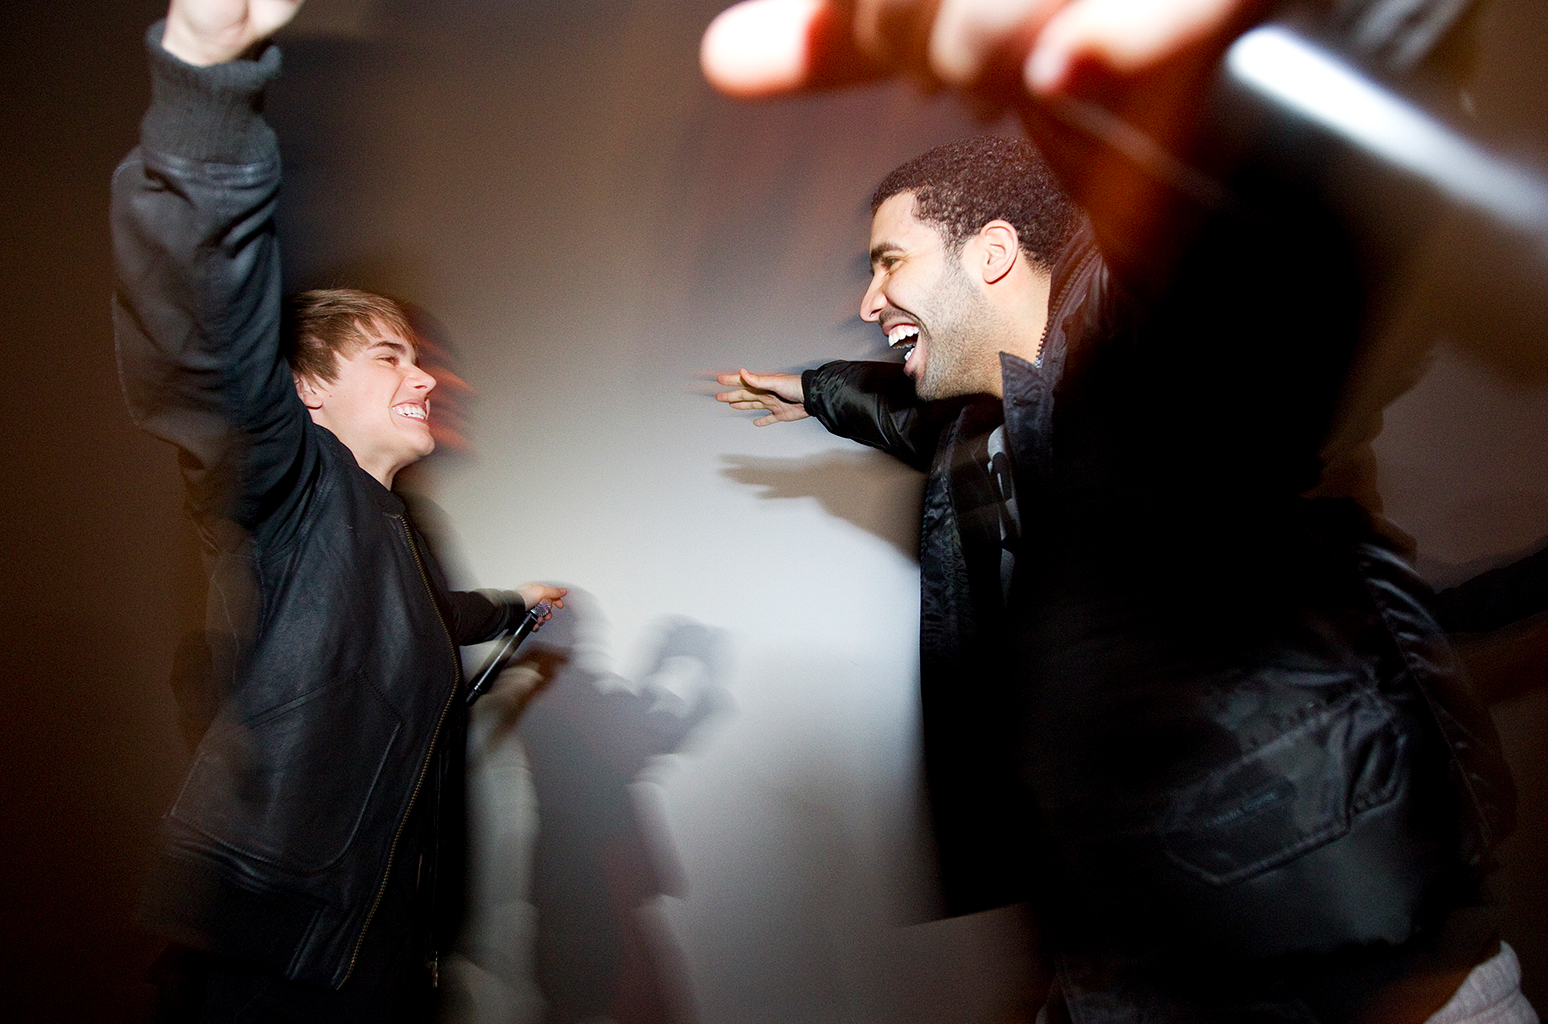 Justin-Bieber-Drake-hug-billboard-1548.jpg